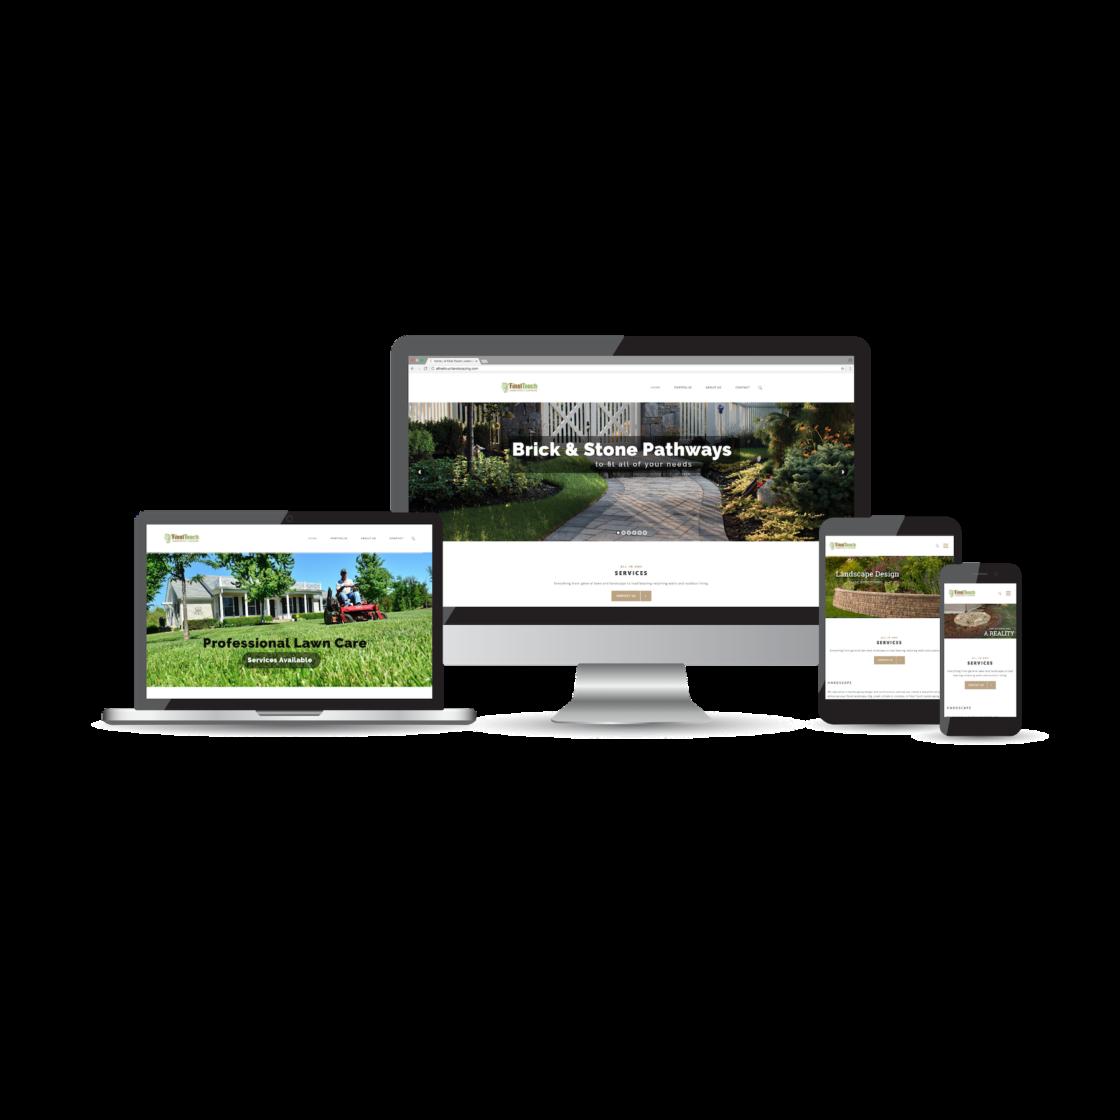 A Final Touch Landscaping & Lawncare Website Design